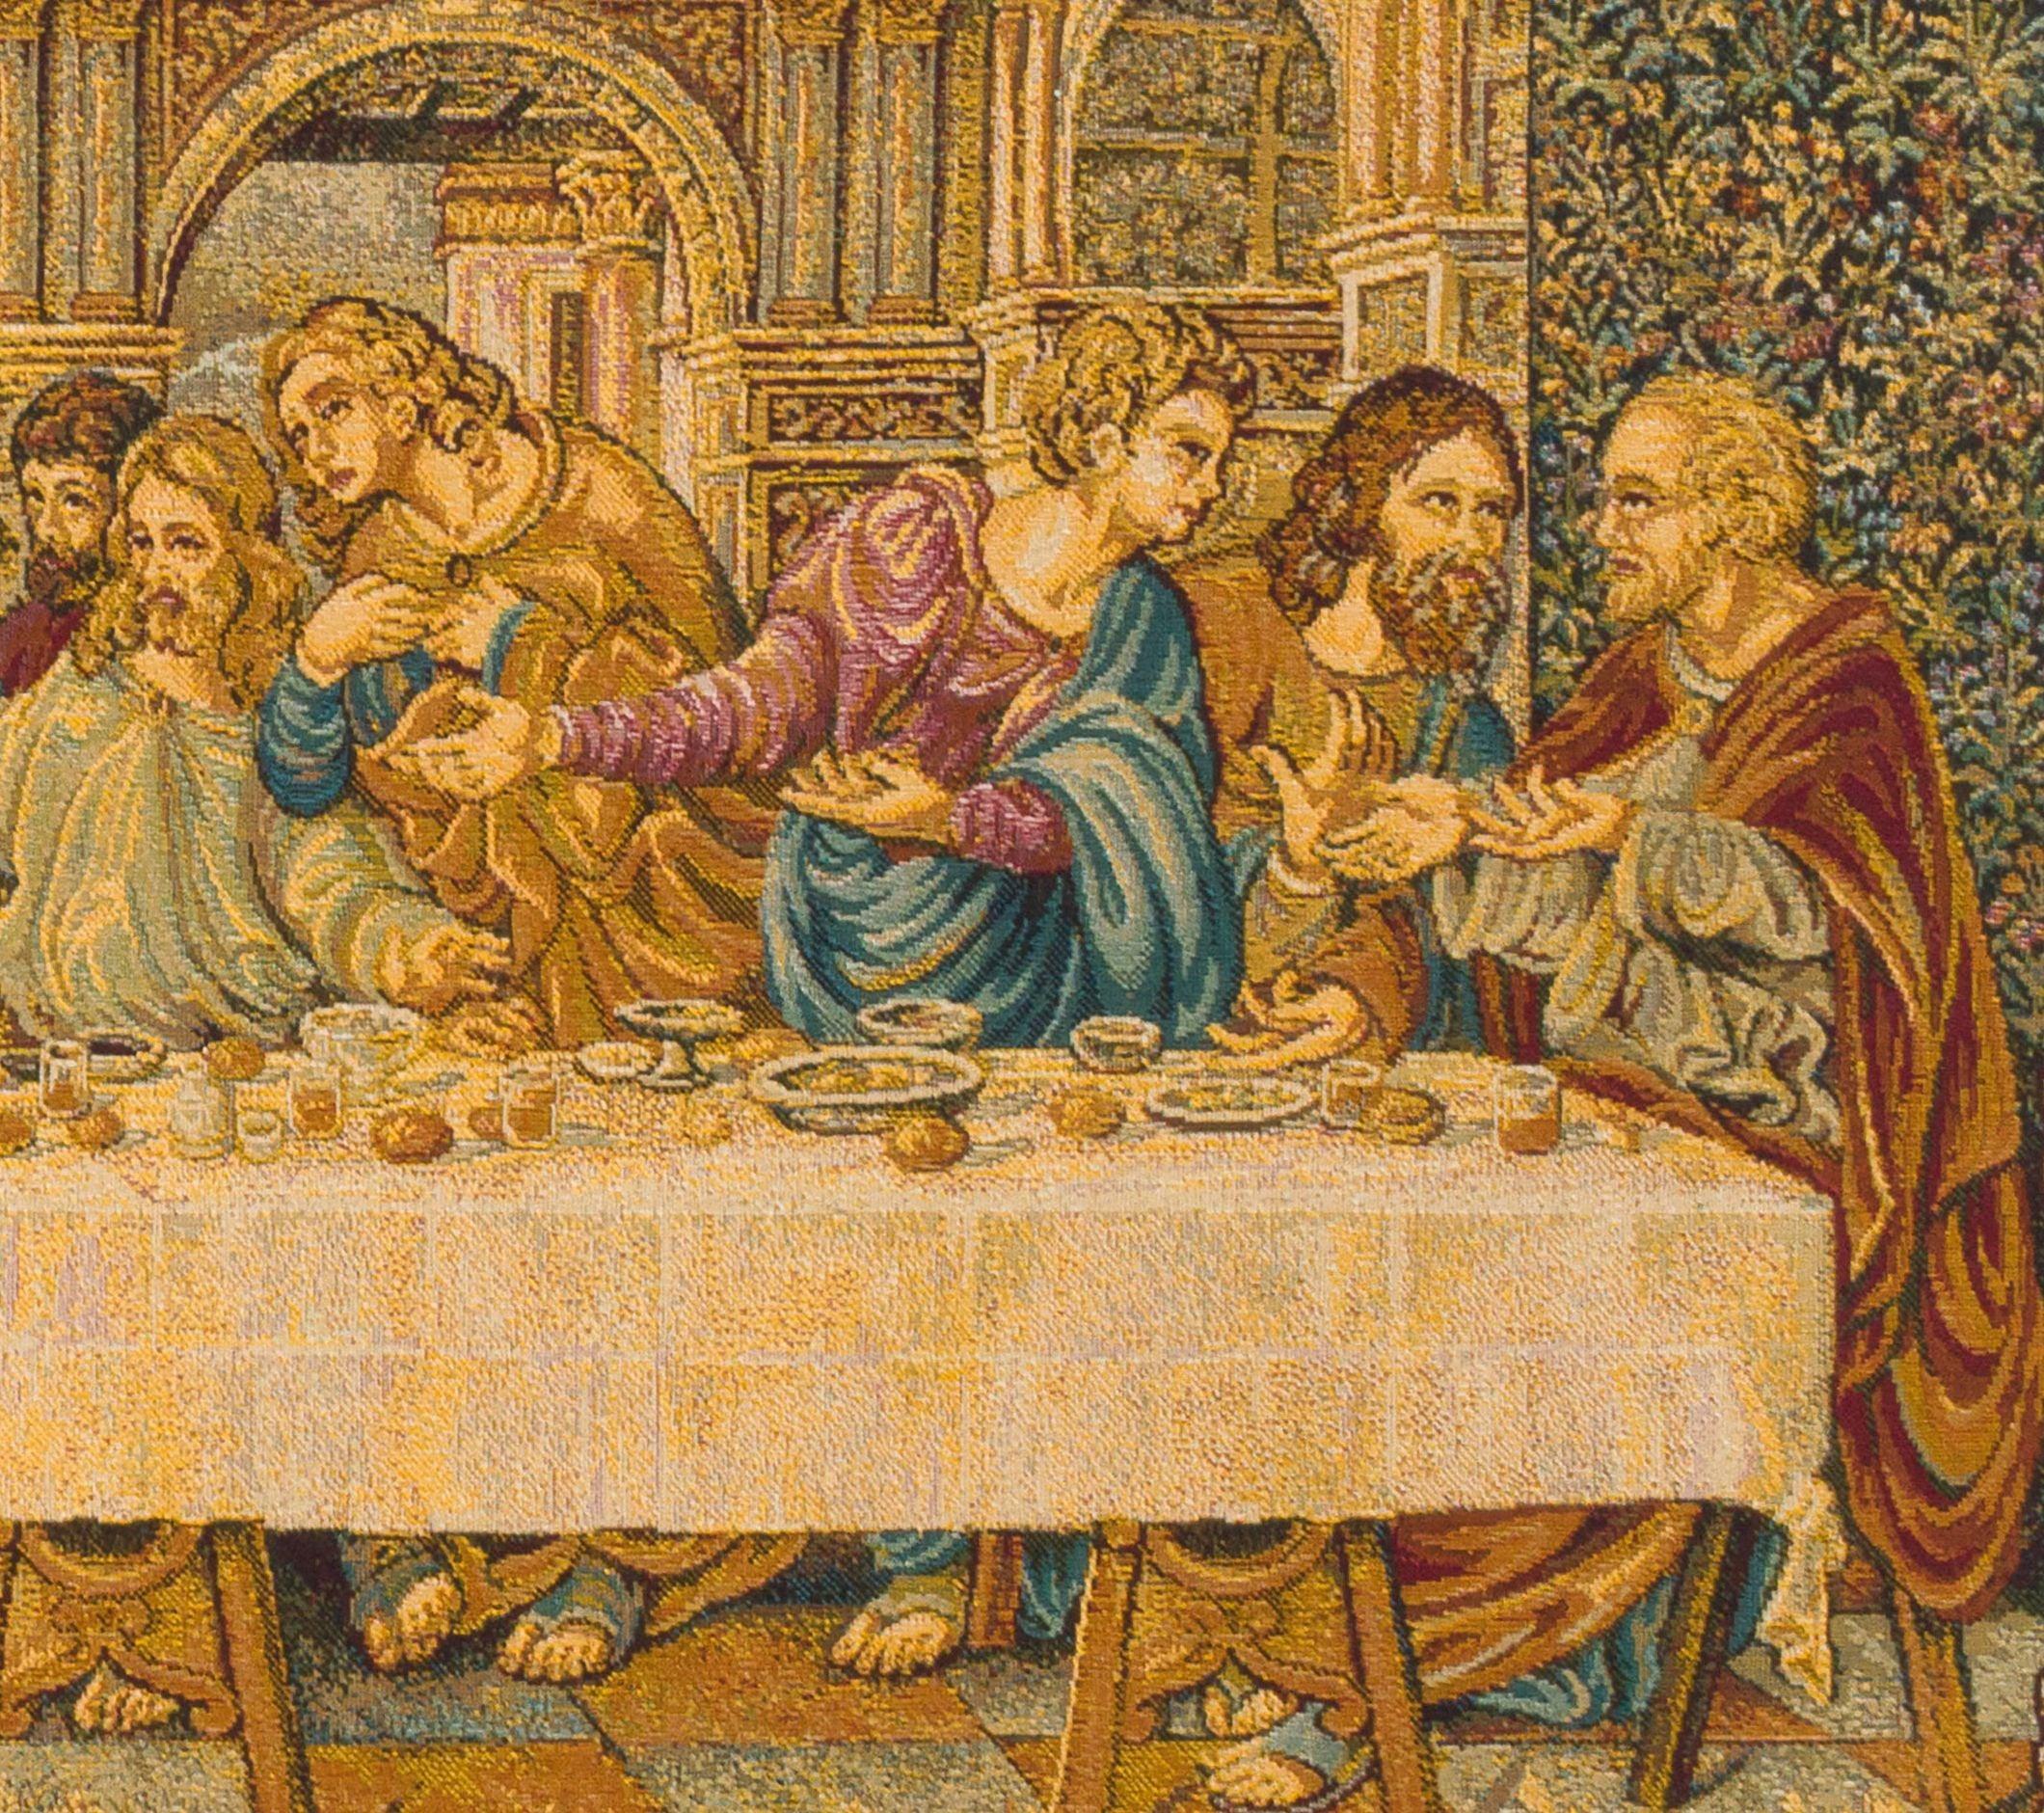 Last Supper Tapestry Wall Hanging Woven Leonardo Da Vinci In 2017 Blended Fabric Leonardo Davinci The Last Supper Wall Hangings (View 10 of 20)